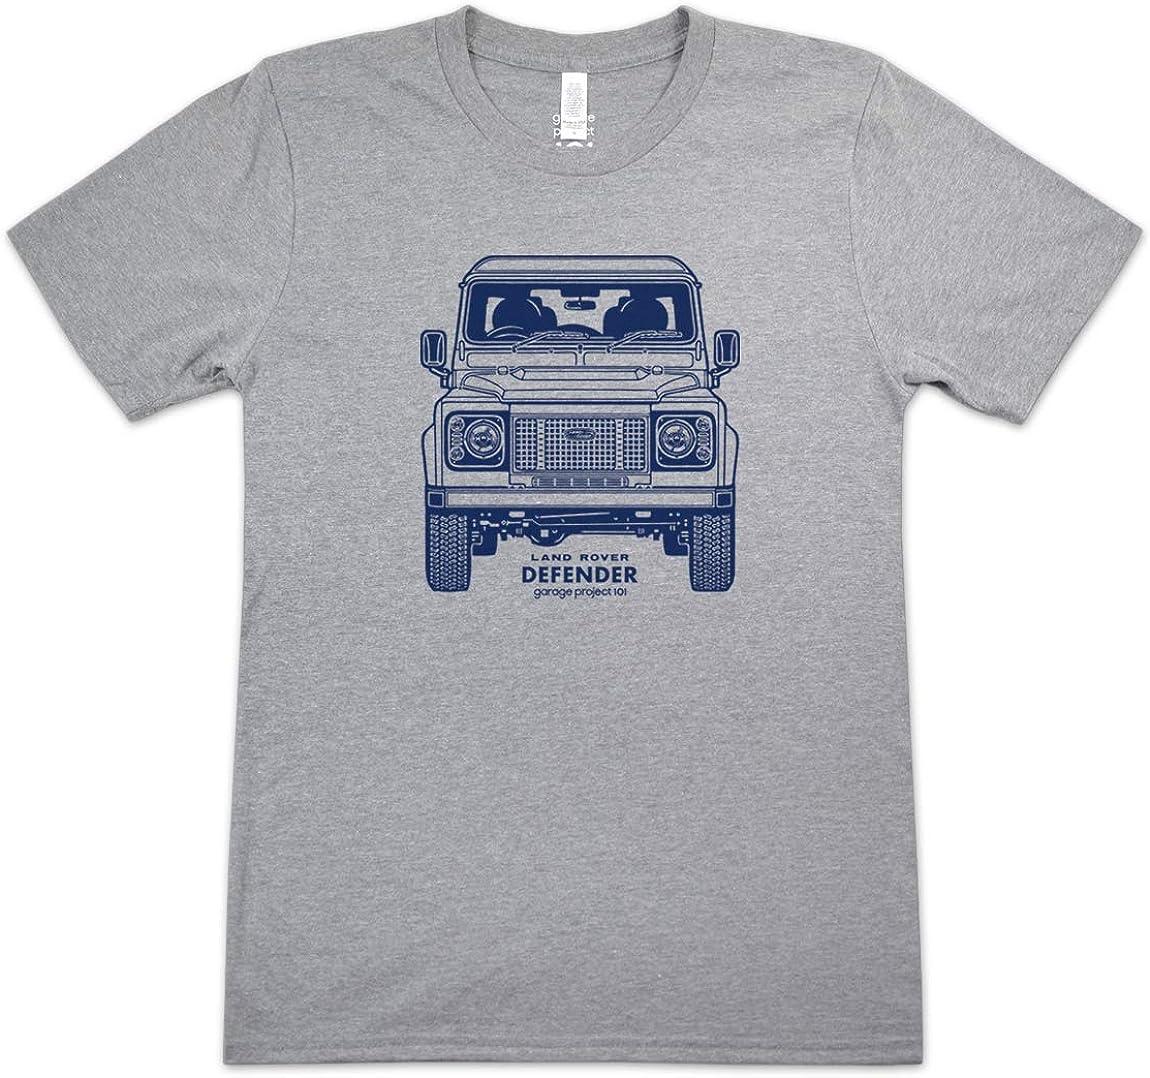 Landrover Range Rover P38 Off Road Land Rover Mens T Shirt